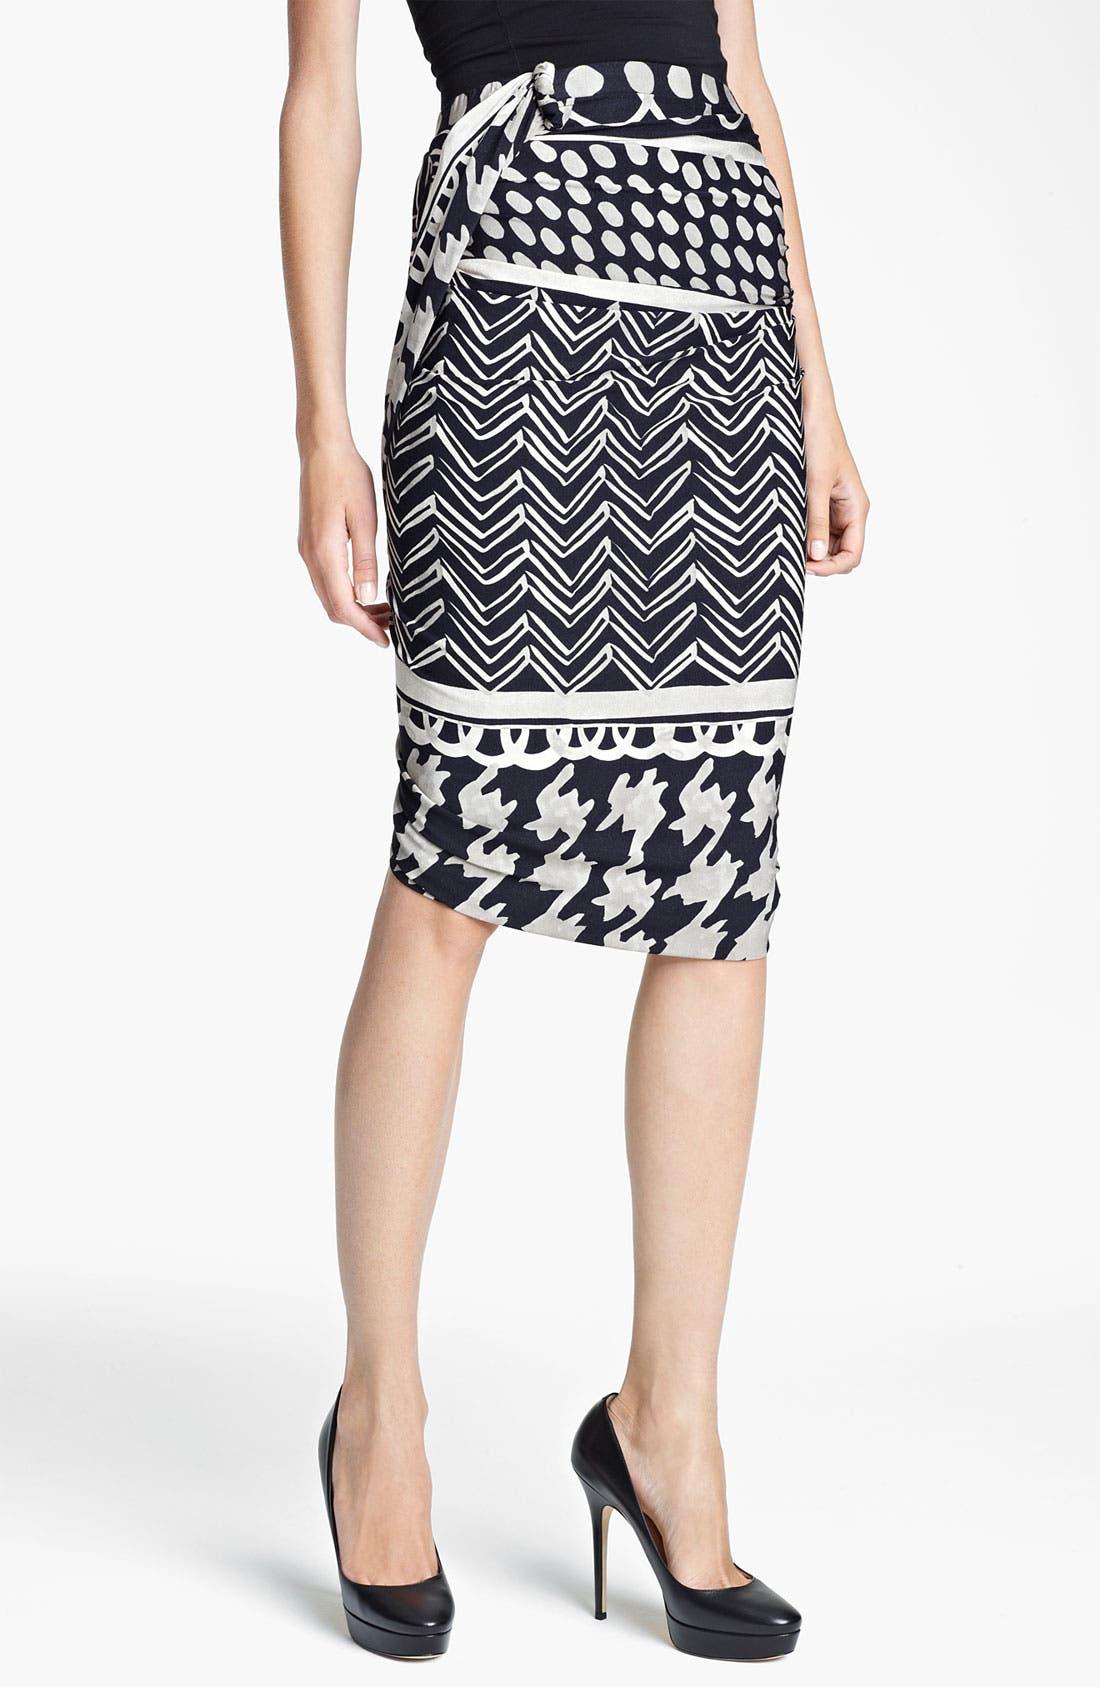 Alternate Image 1 Selected - Max Mara 'Ombrato' Print Jersey Tulip Skirt